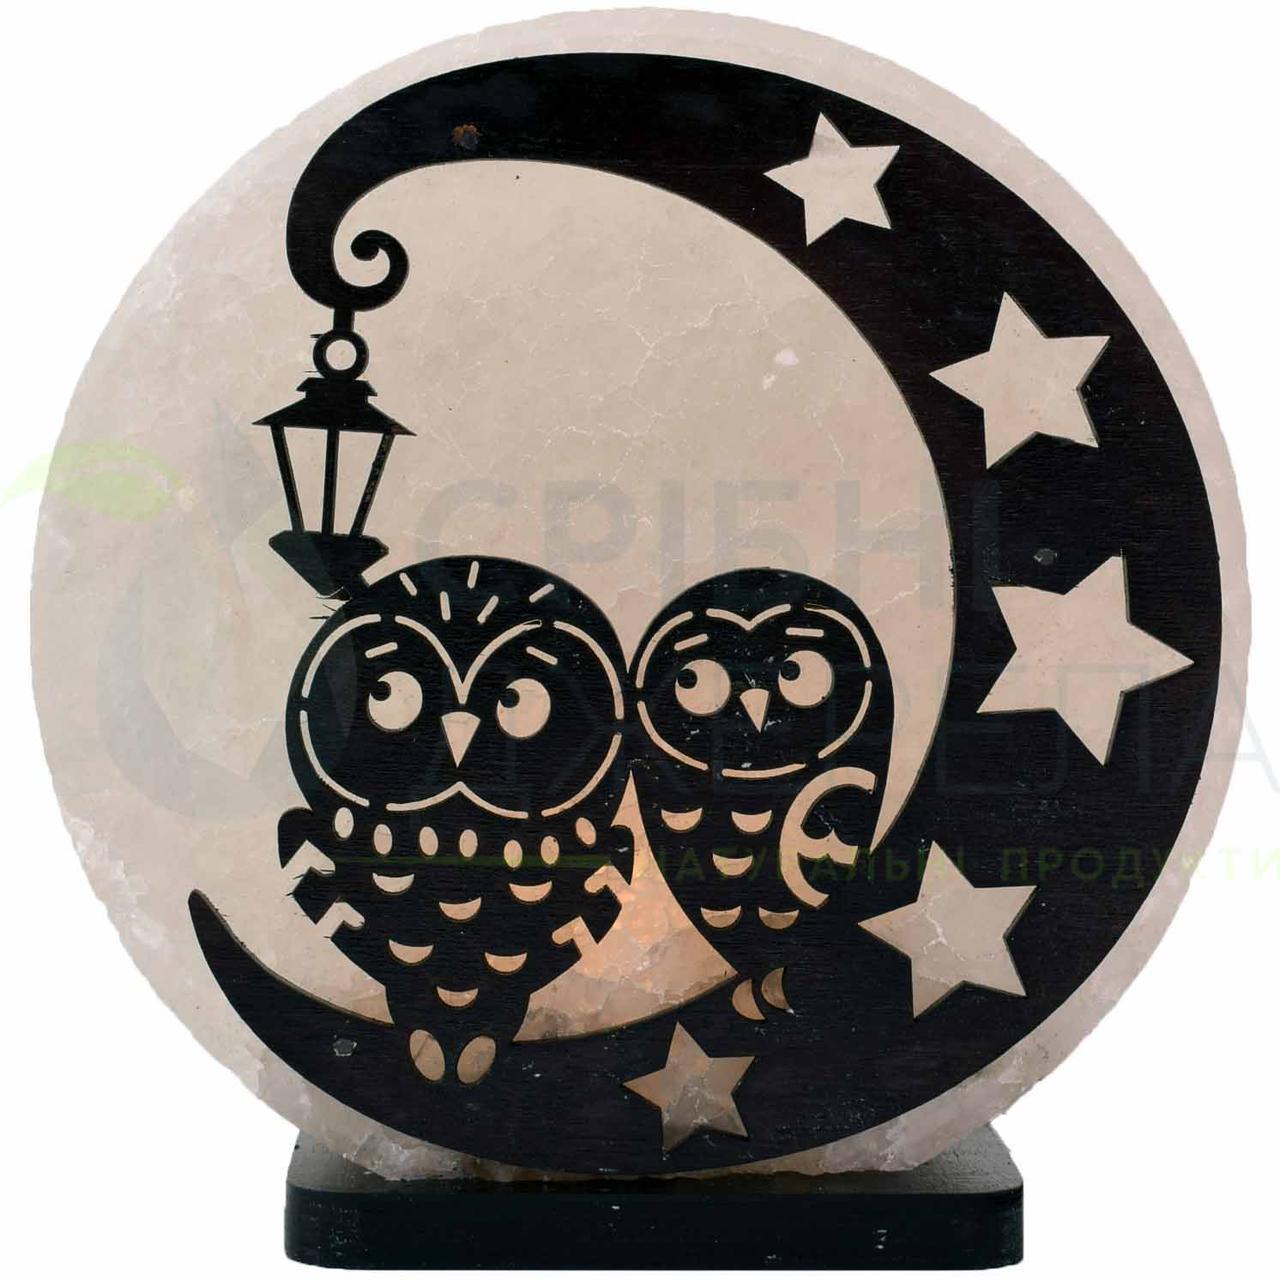 Соляна лампа Сови на місяці, 3-4 кг